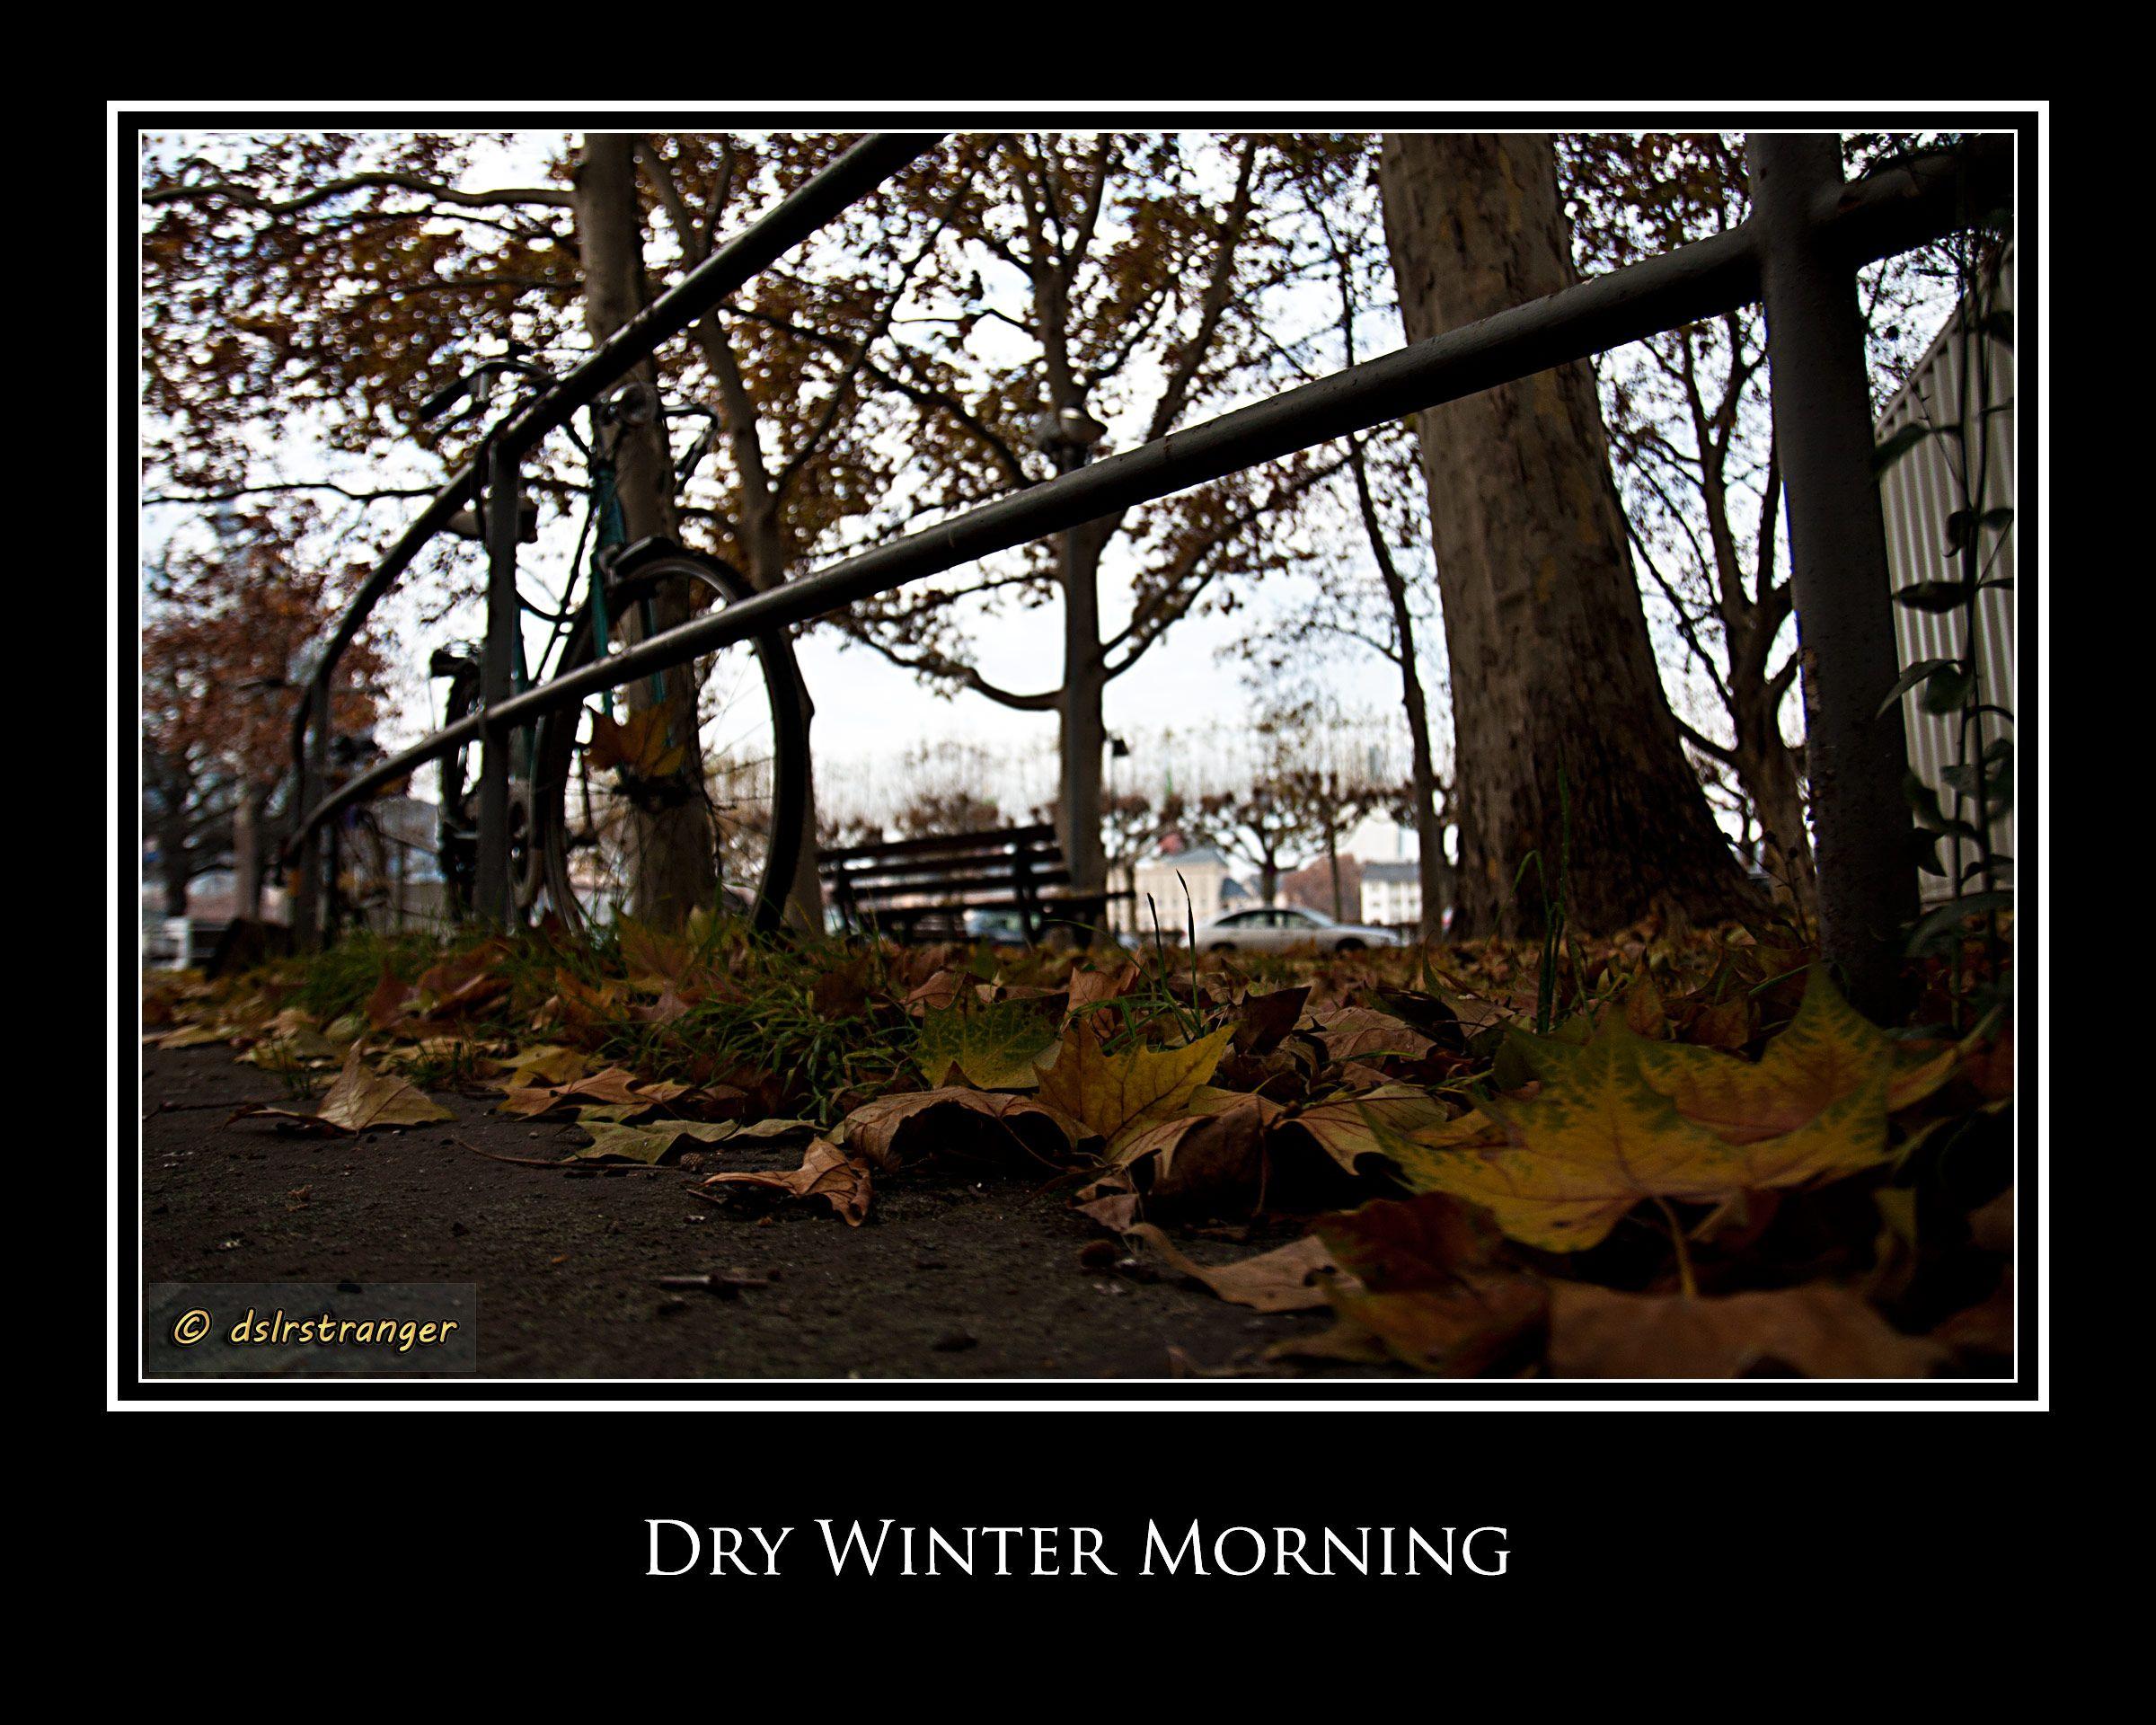 Morning Dry